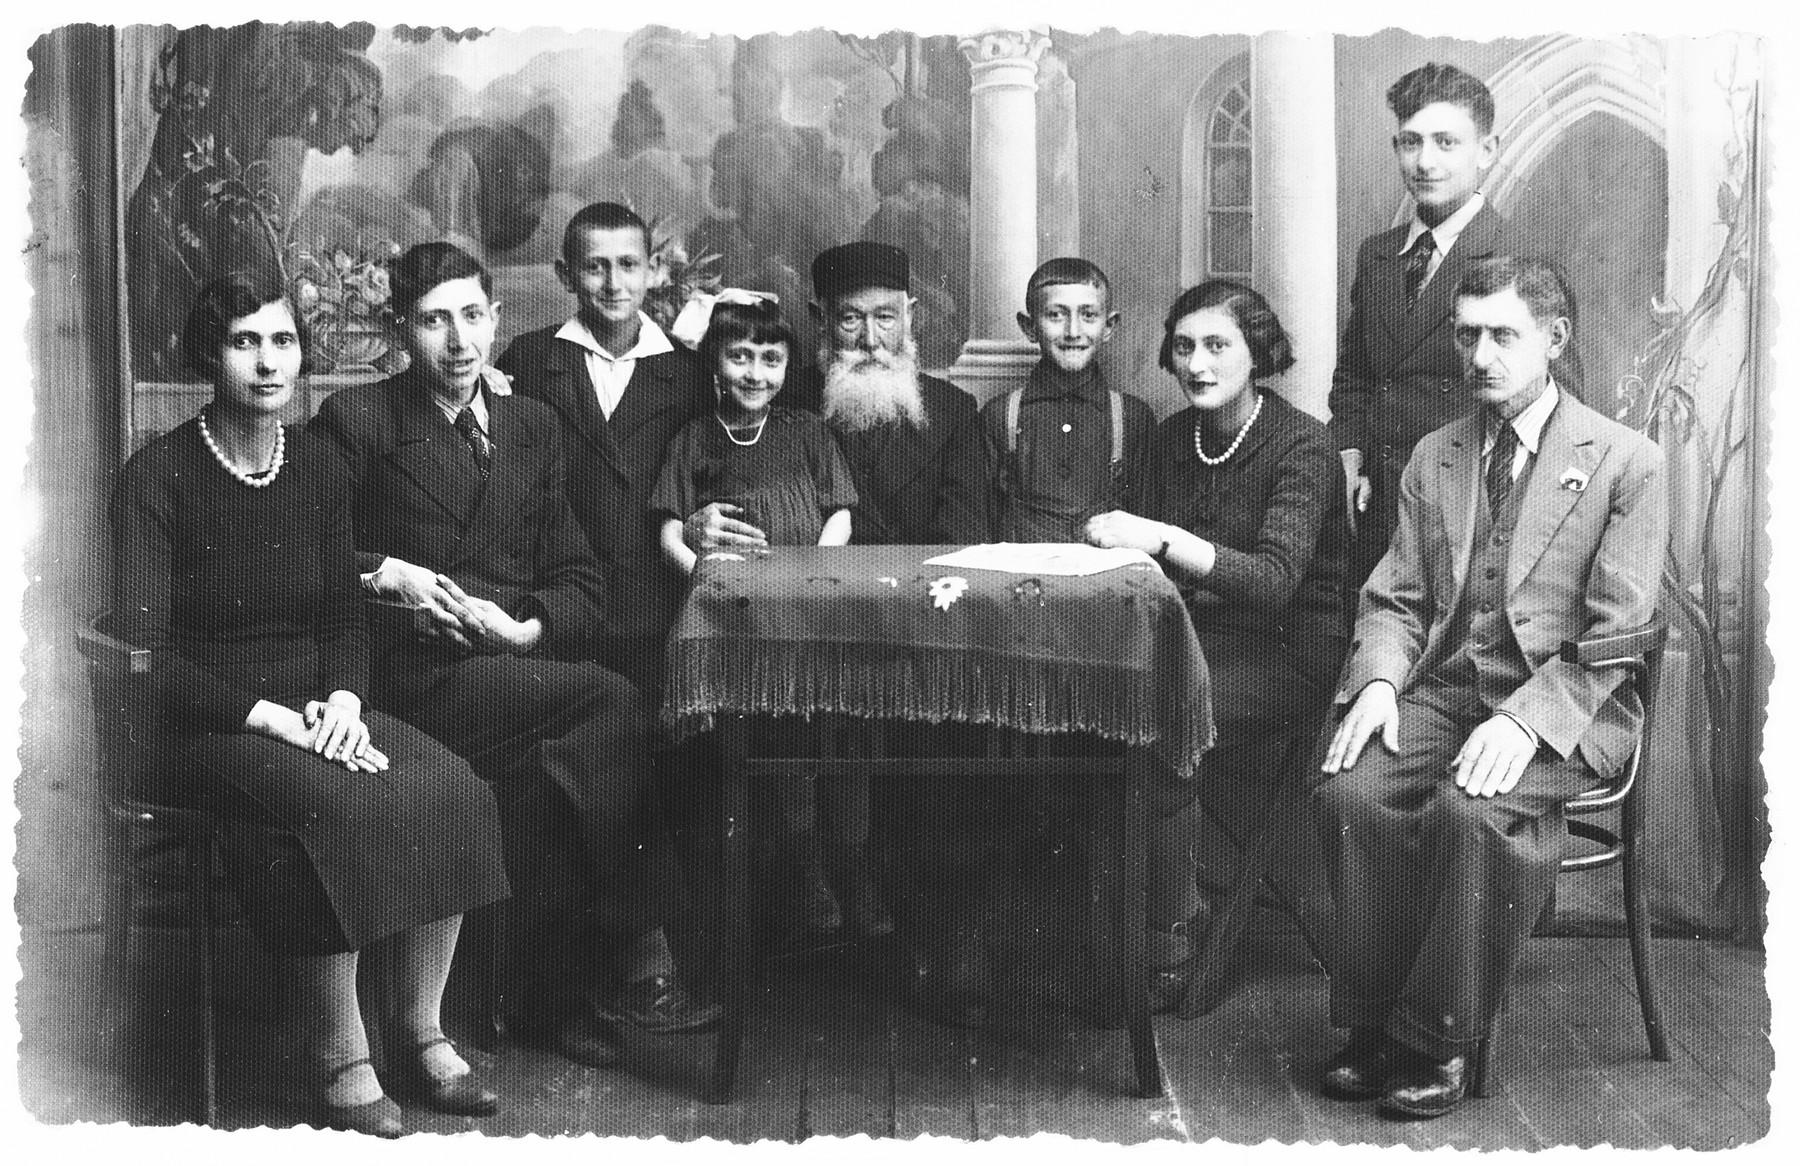 Studio portrait of a multi-generational Jewish family in prewar Zelow, Poland.